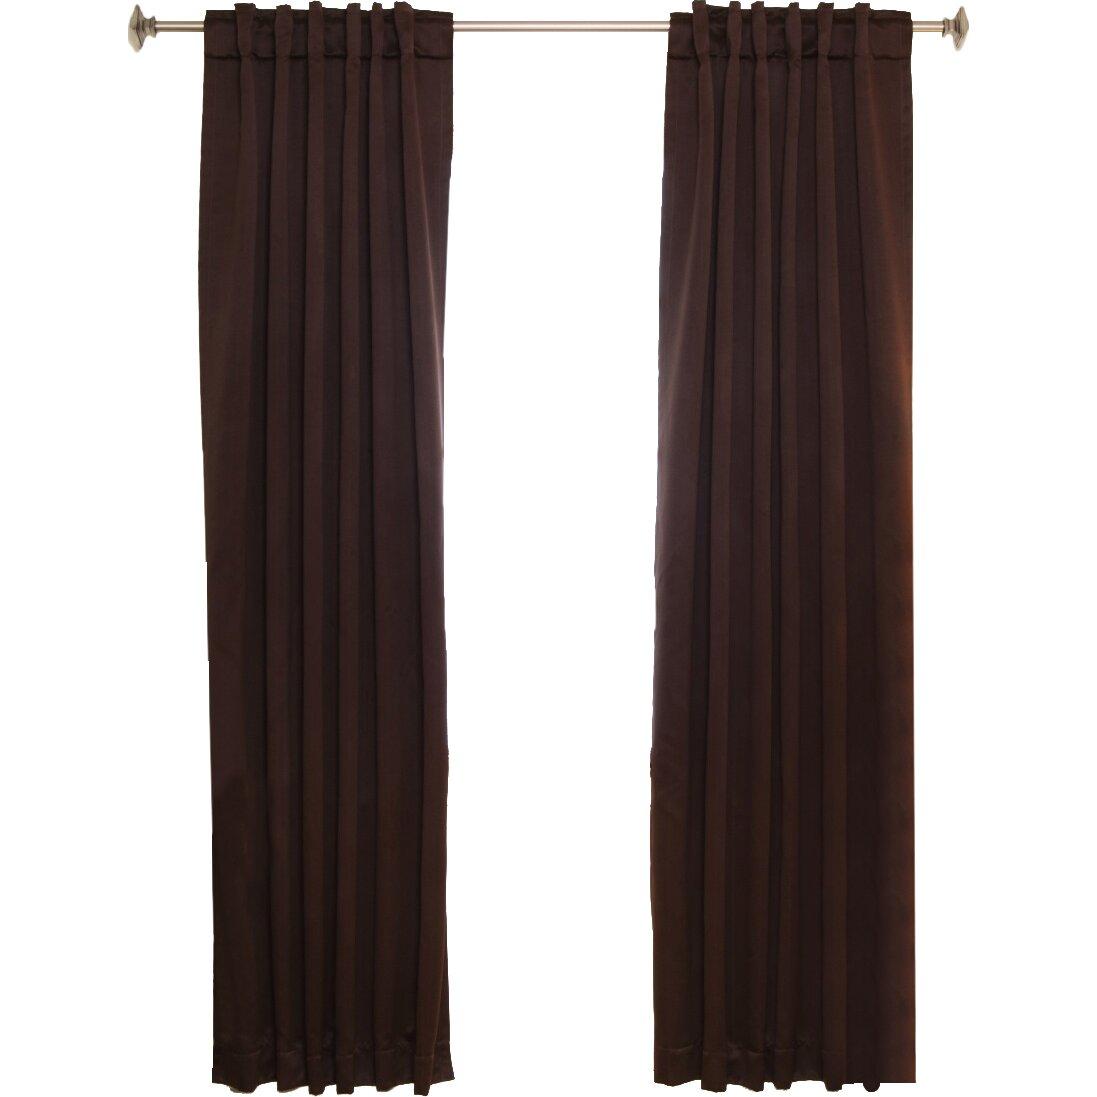 Blackout Curtain Blackout Rod Pocket Curtain Panel Set Of 2 Reviews Wayfair